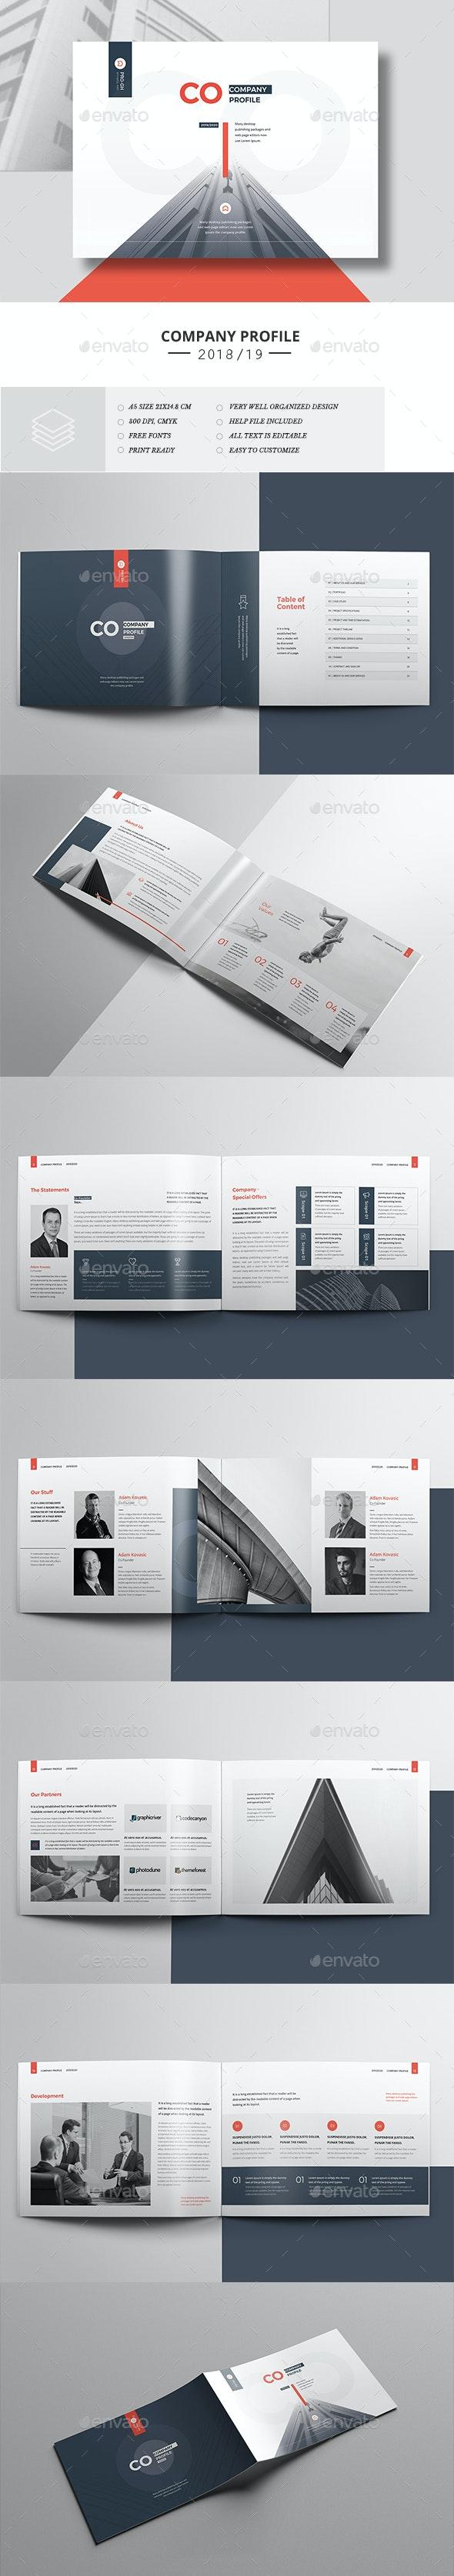 Company Profile 16 Pages Landscape - Corporate Brochures